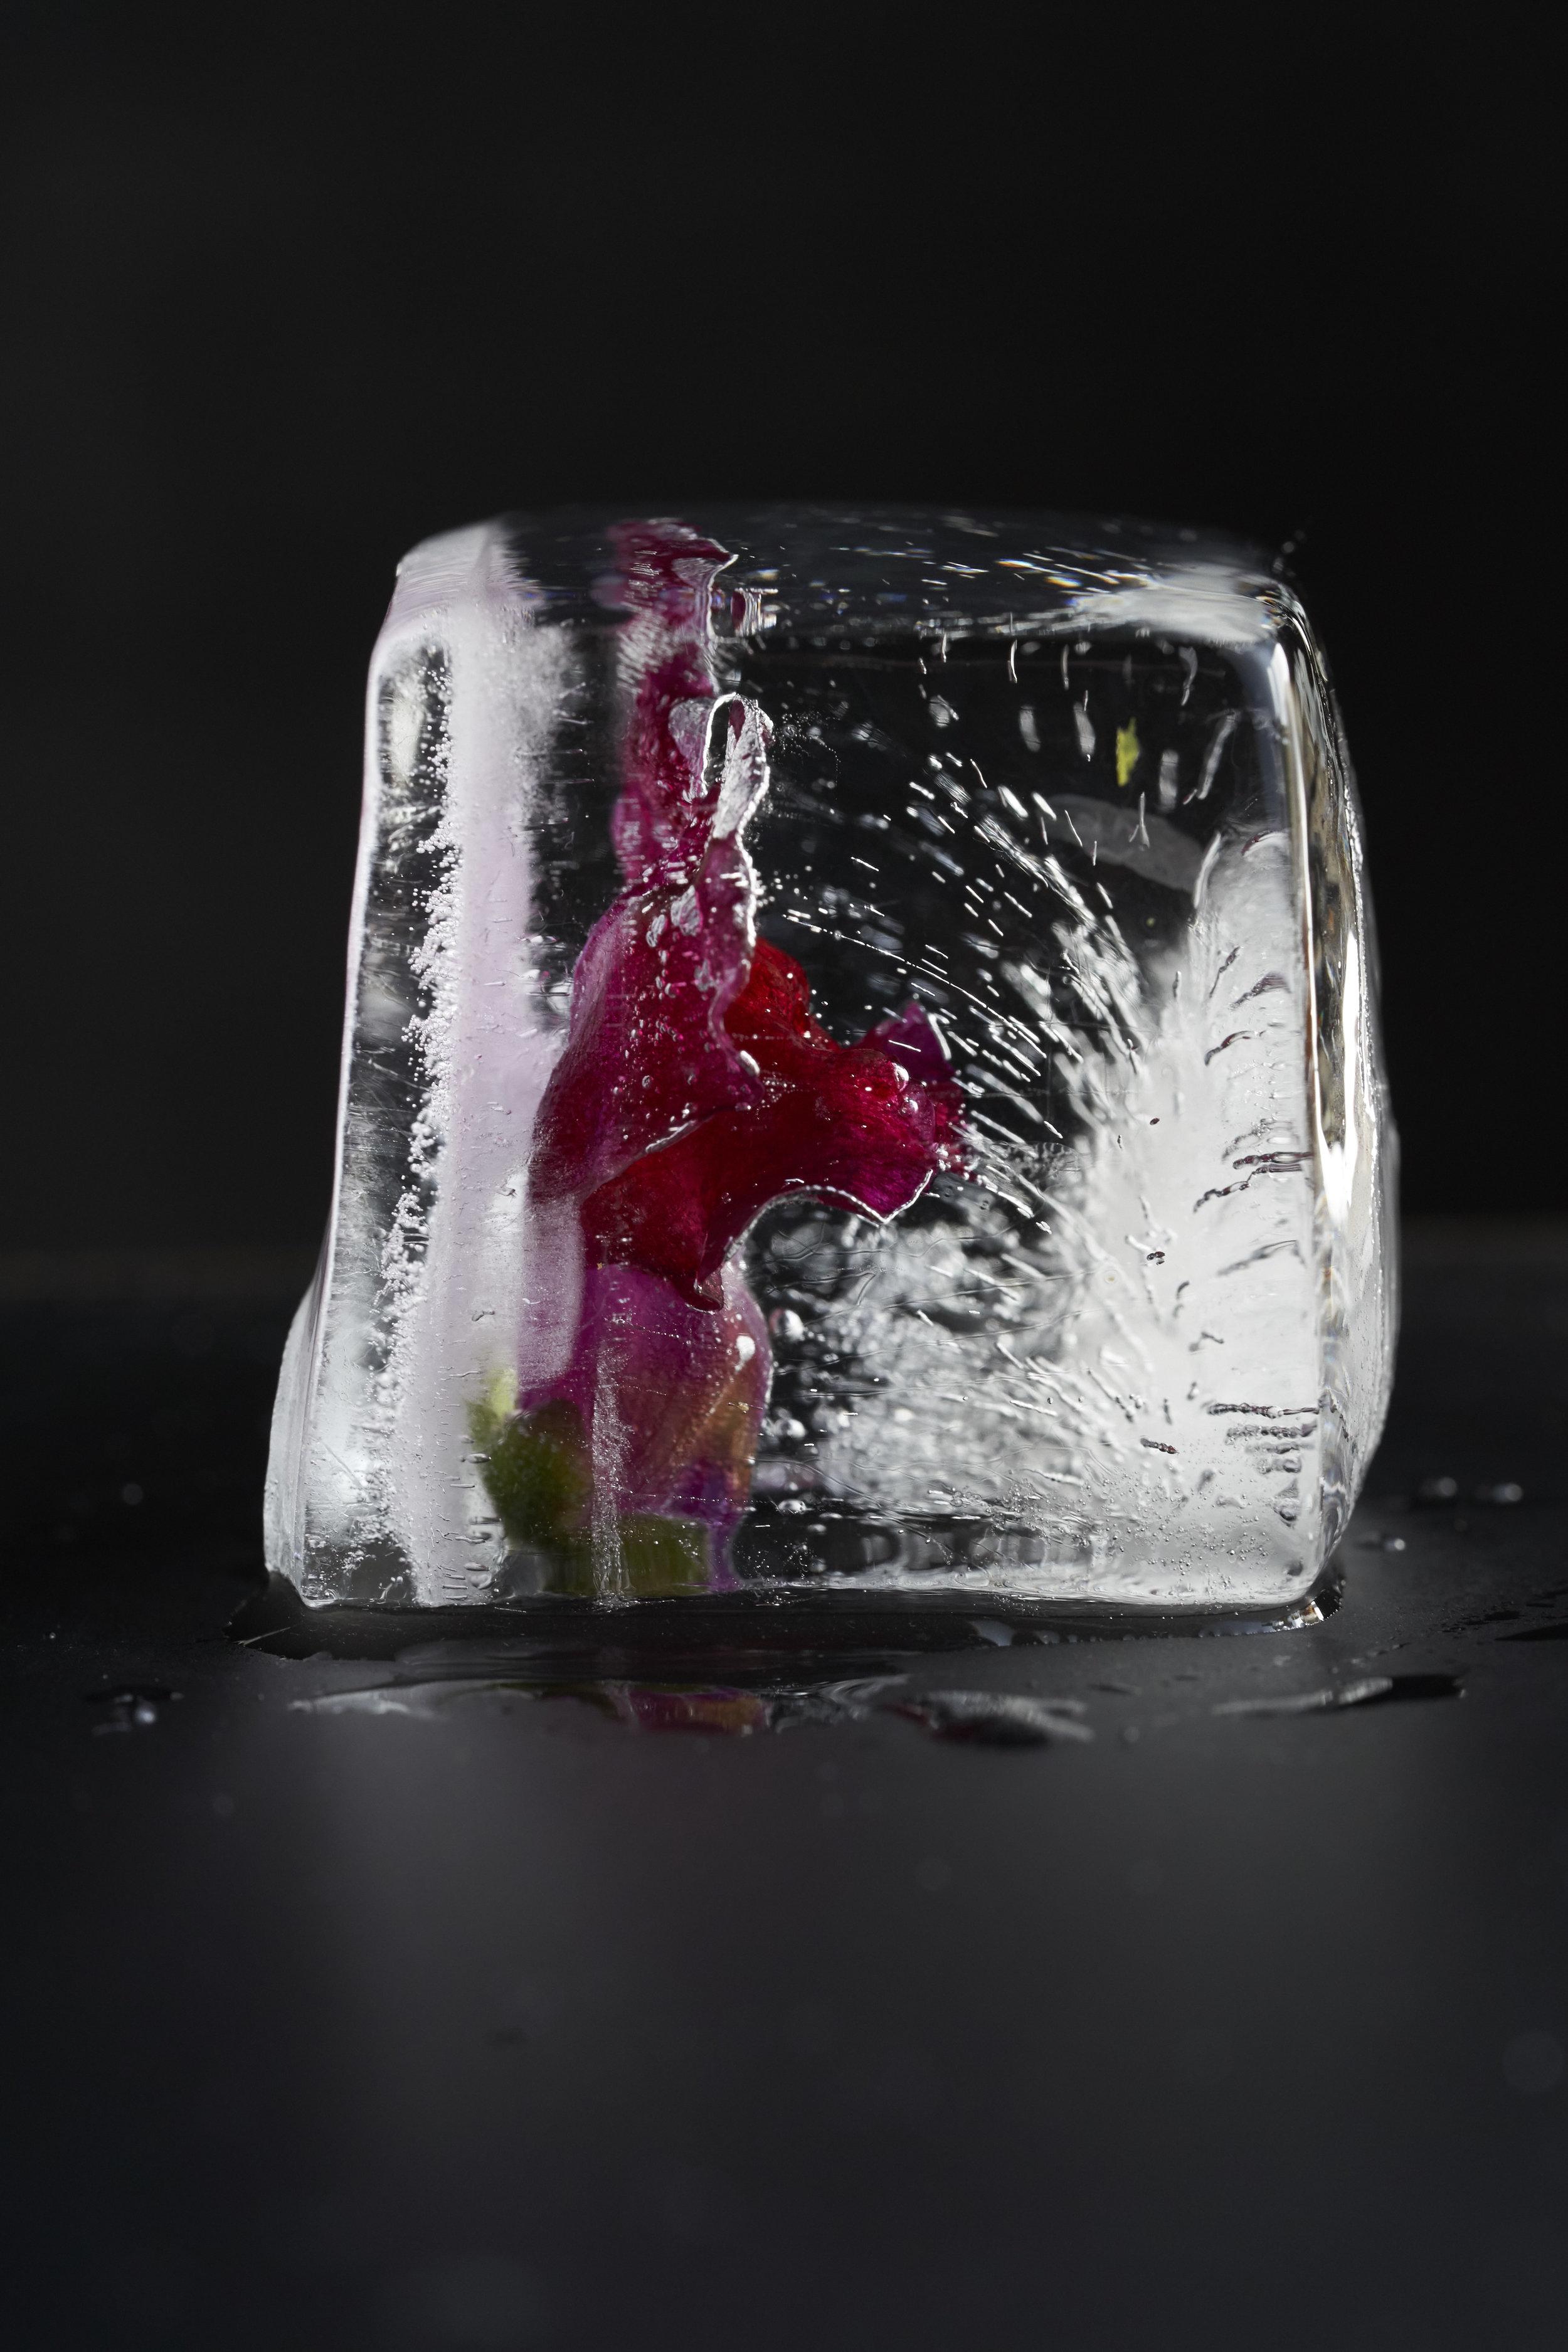 Ice_0358.jpg